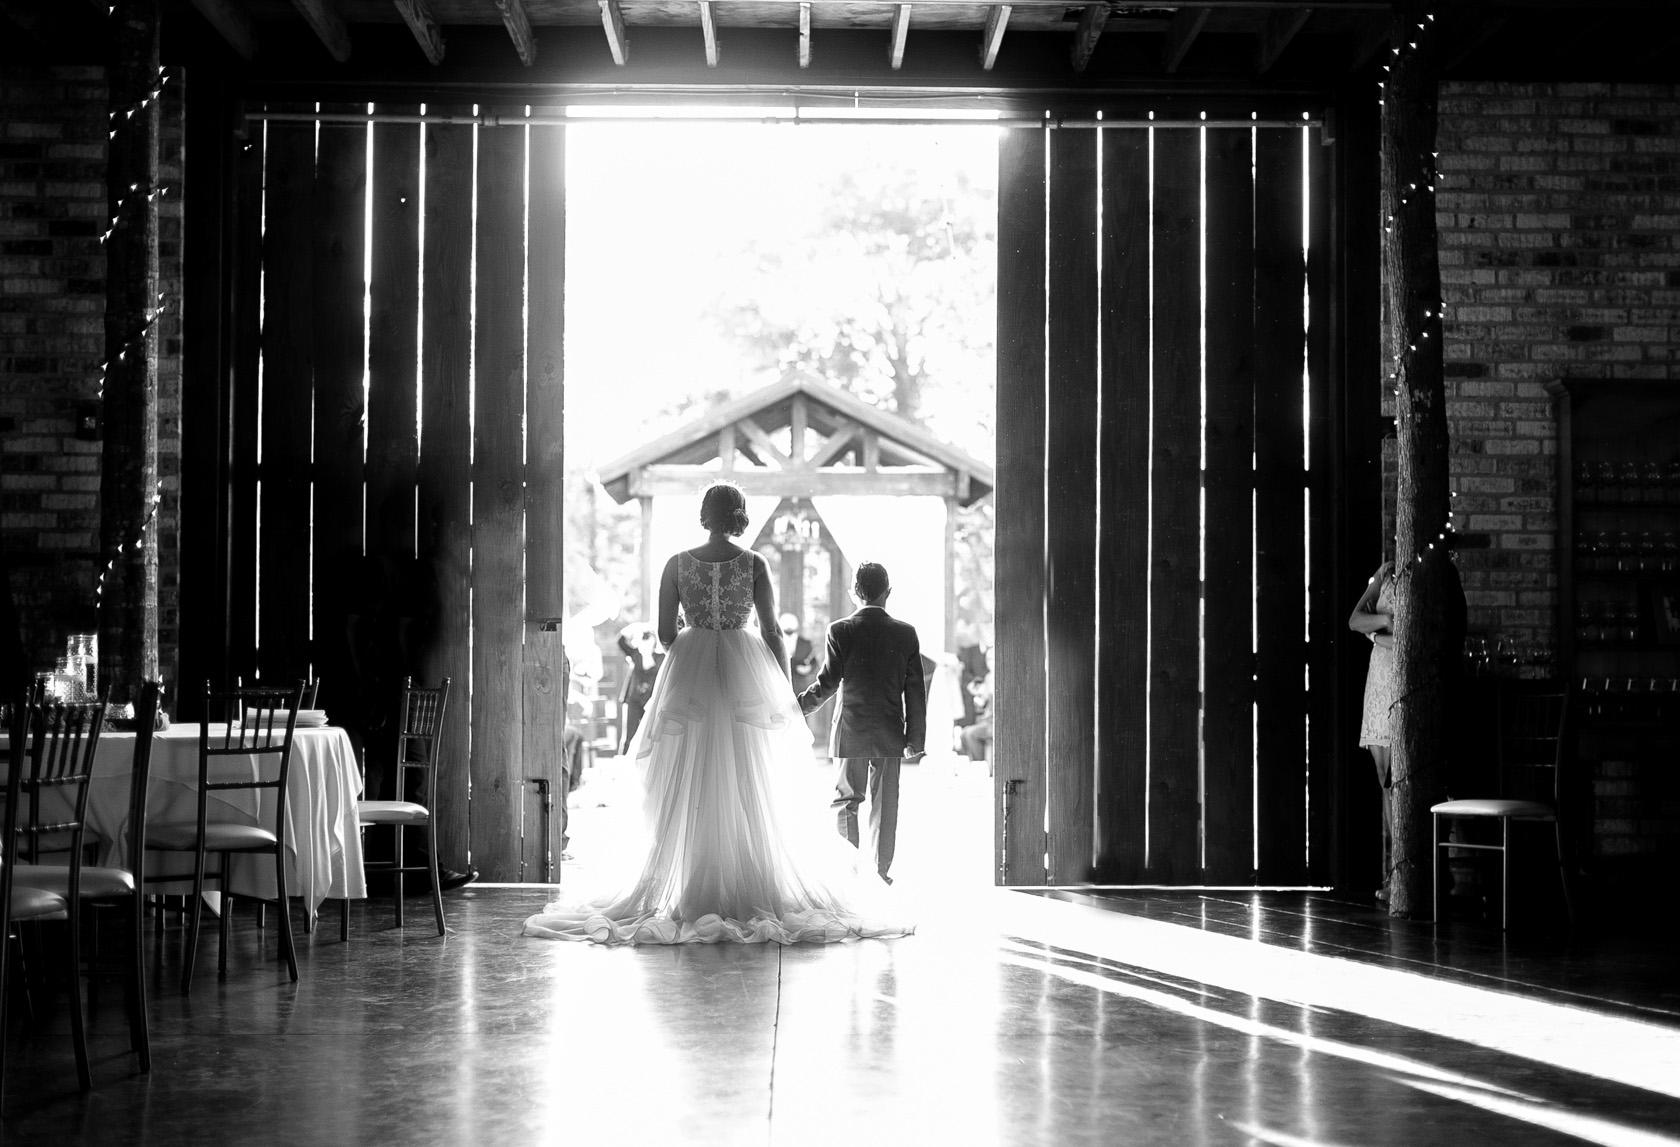 berry barn wedding ceremony - 03